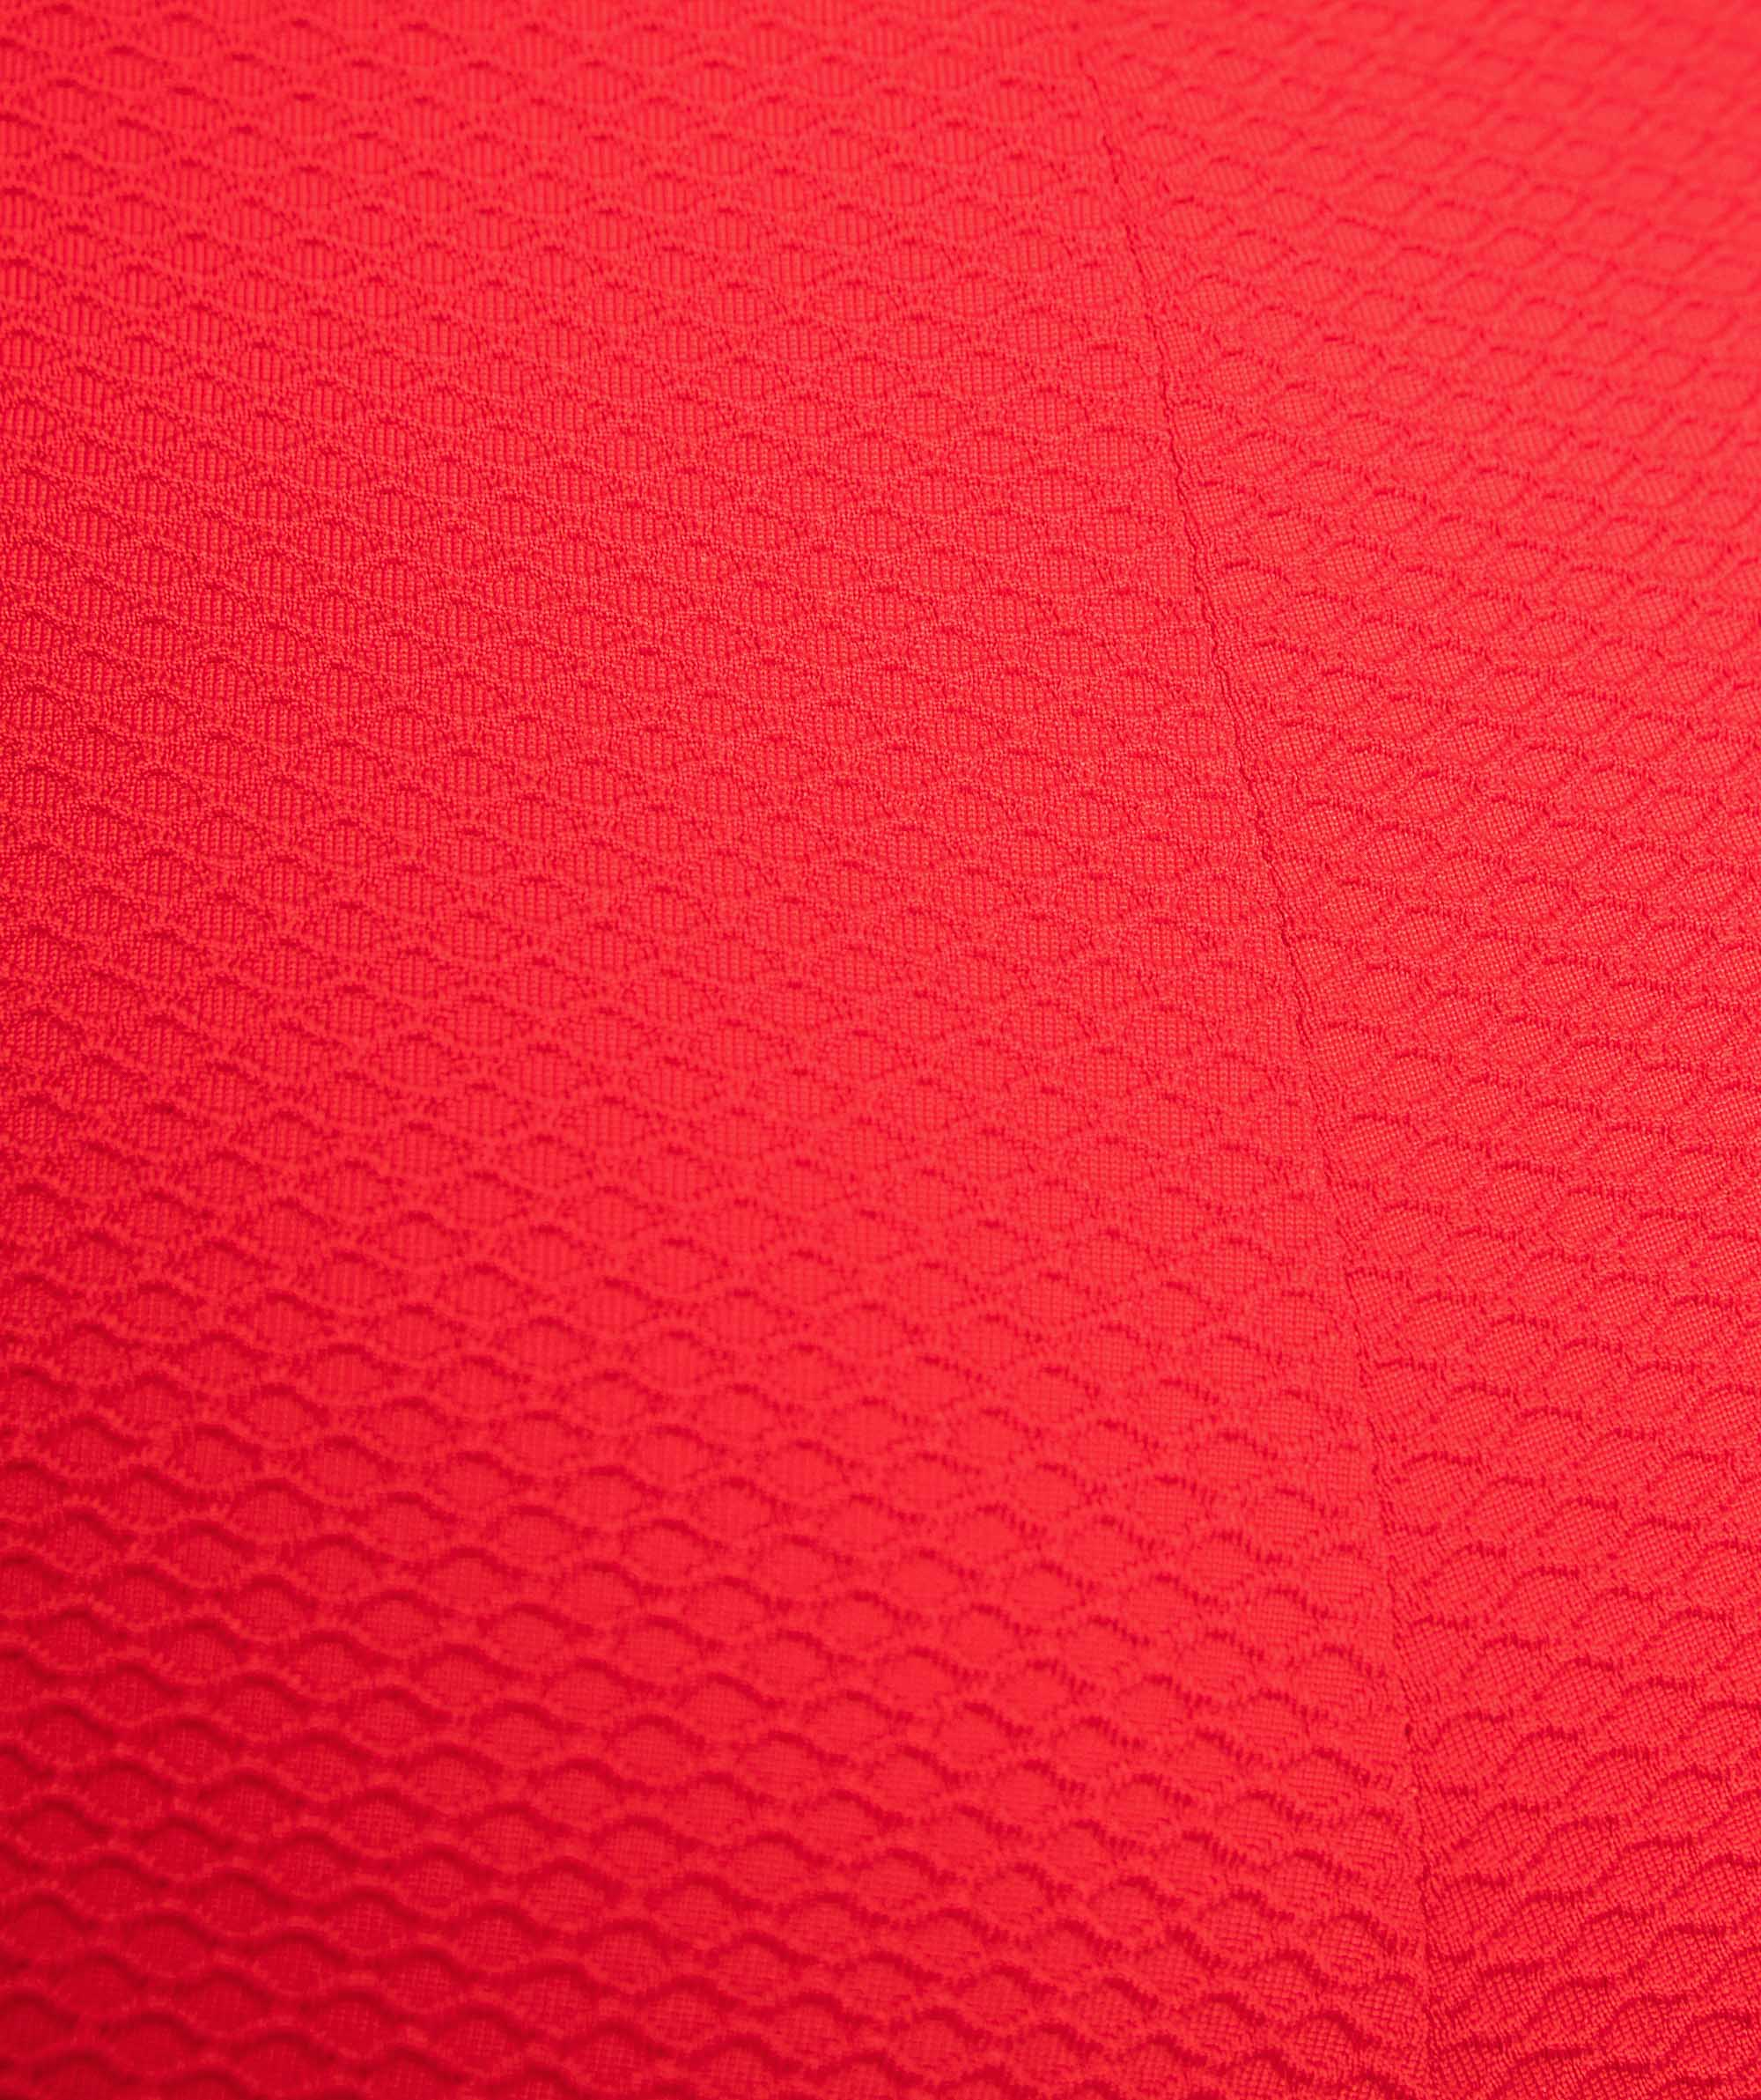 Vamp Bahamas Textured Plunge Swim Top - Red